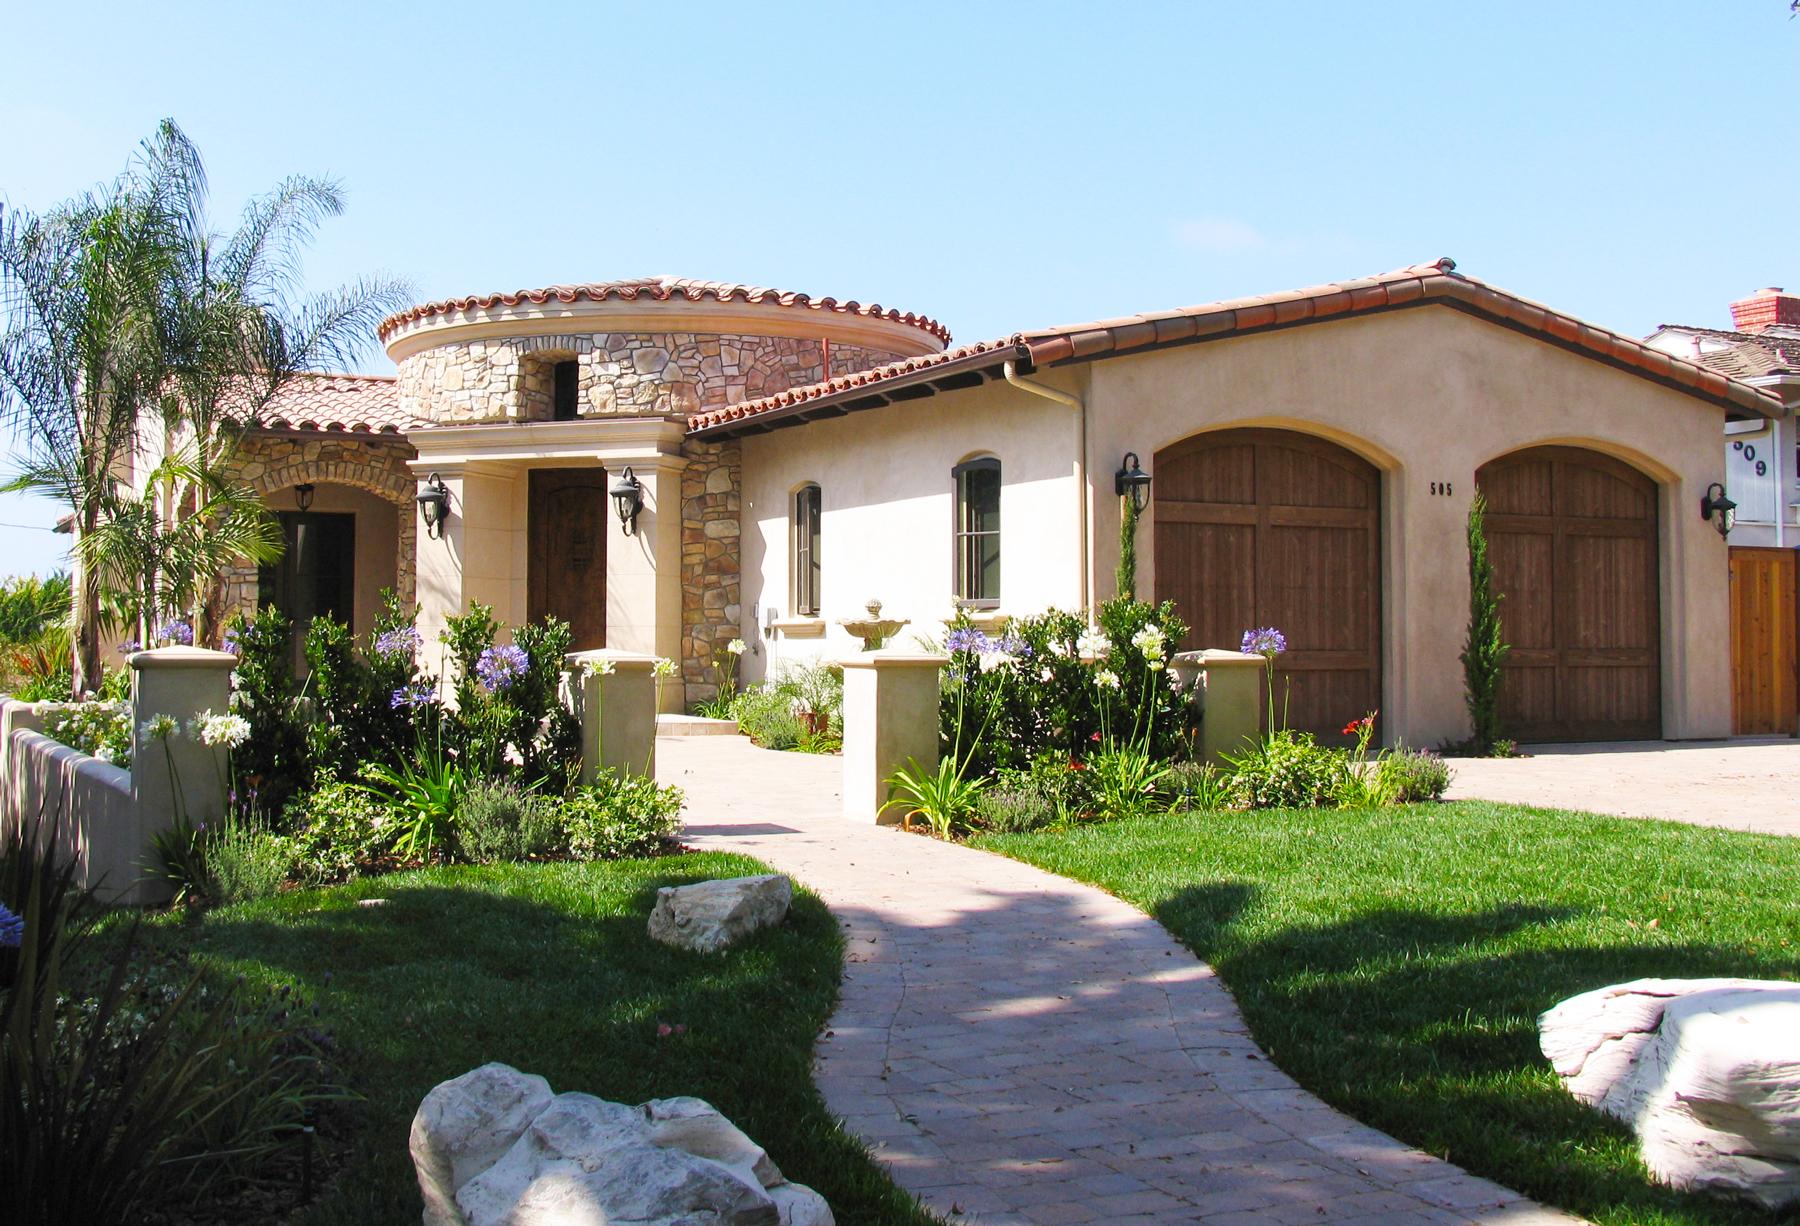 Palmdale-beutiful-home